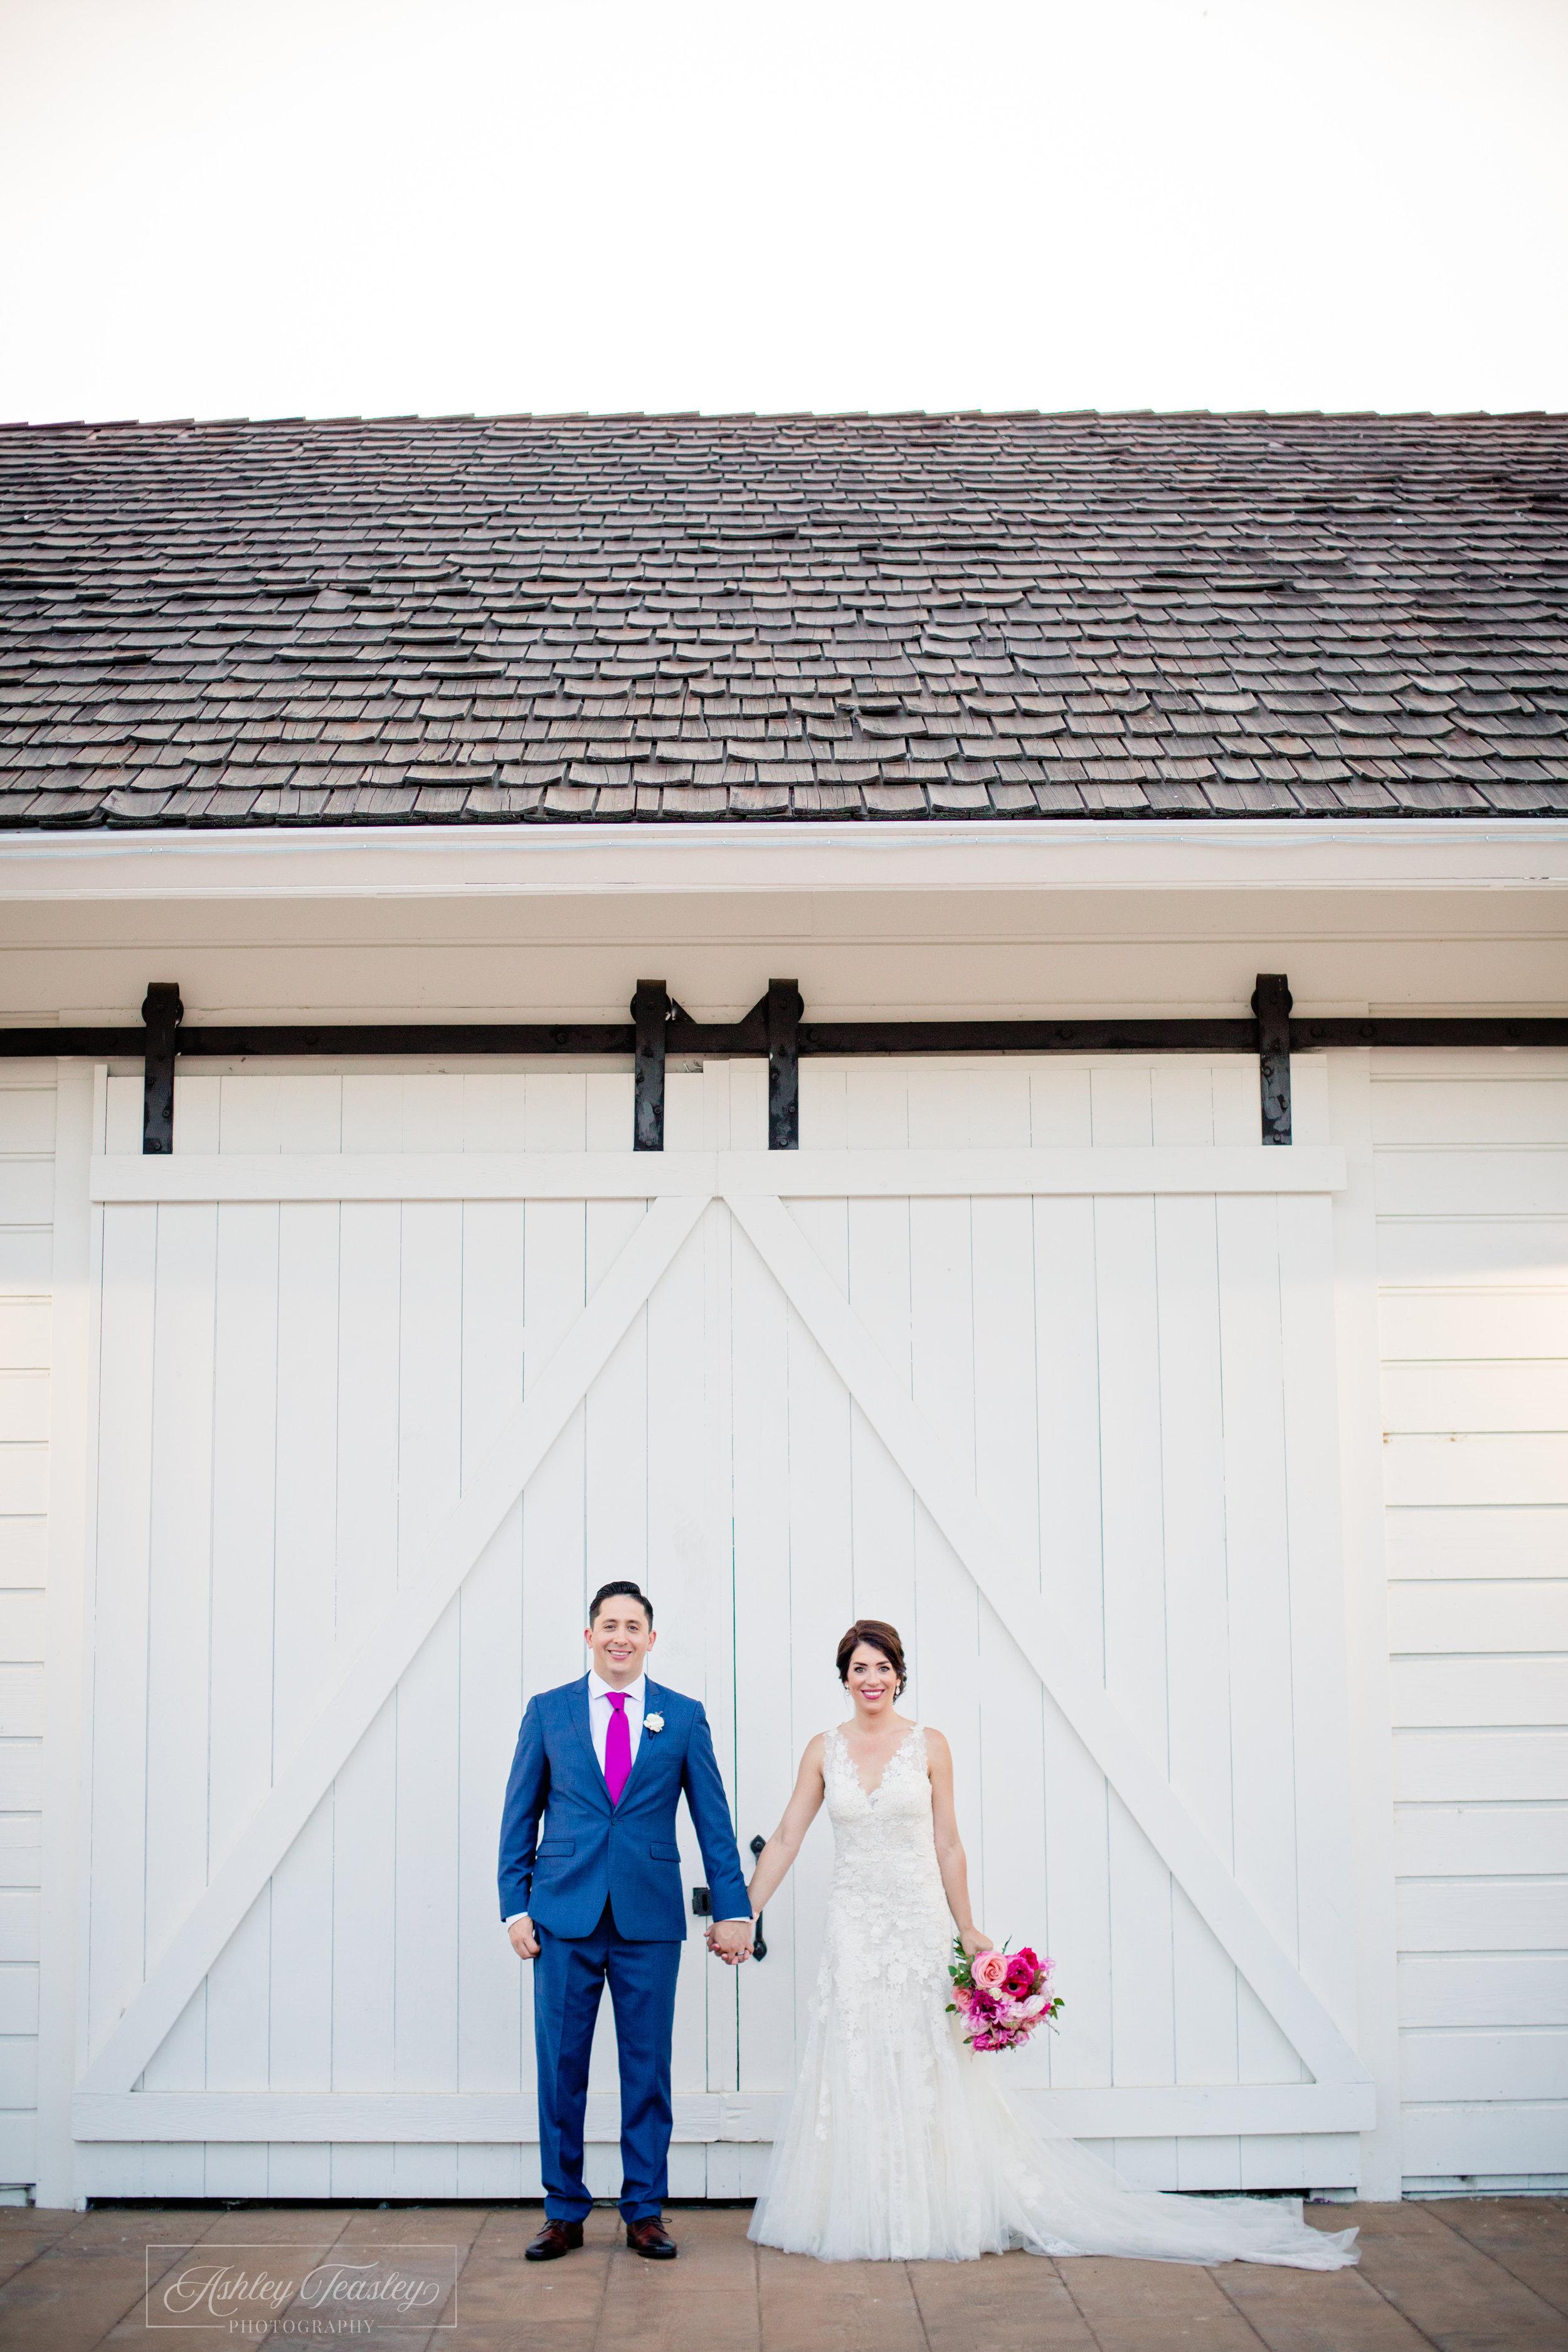 Tarrah & Francisco - The Kimpton Sawyer Hotel - The Firehouse Old Sac - Sacramento Wedding Photographer - Ashley Teasley Photography (58 of 118).jpg